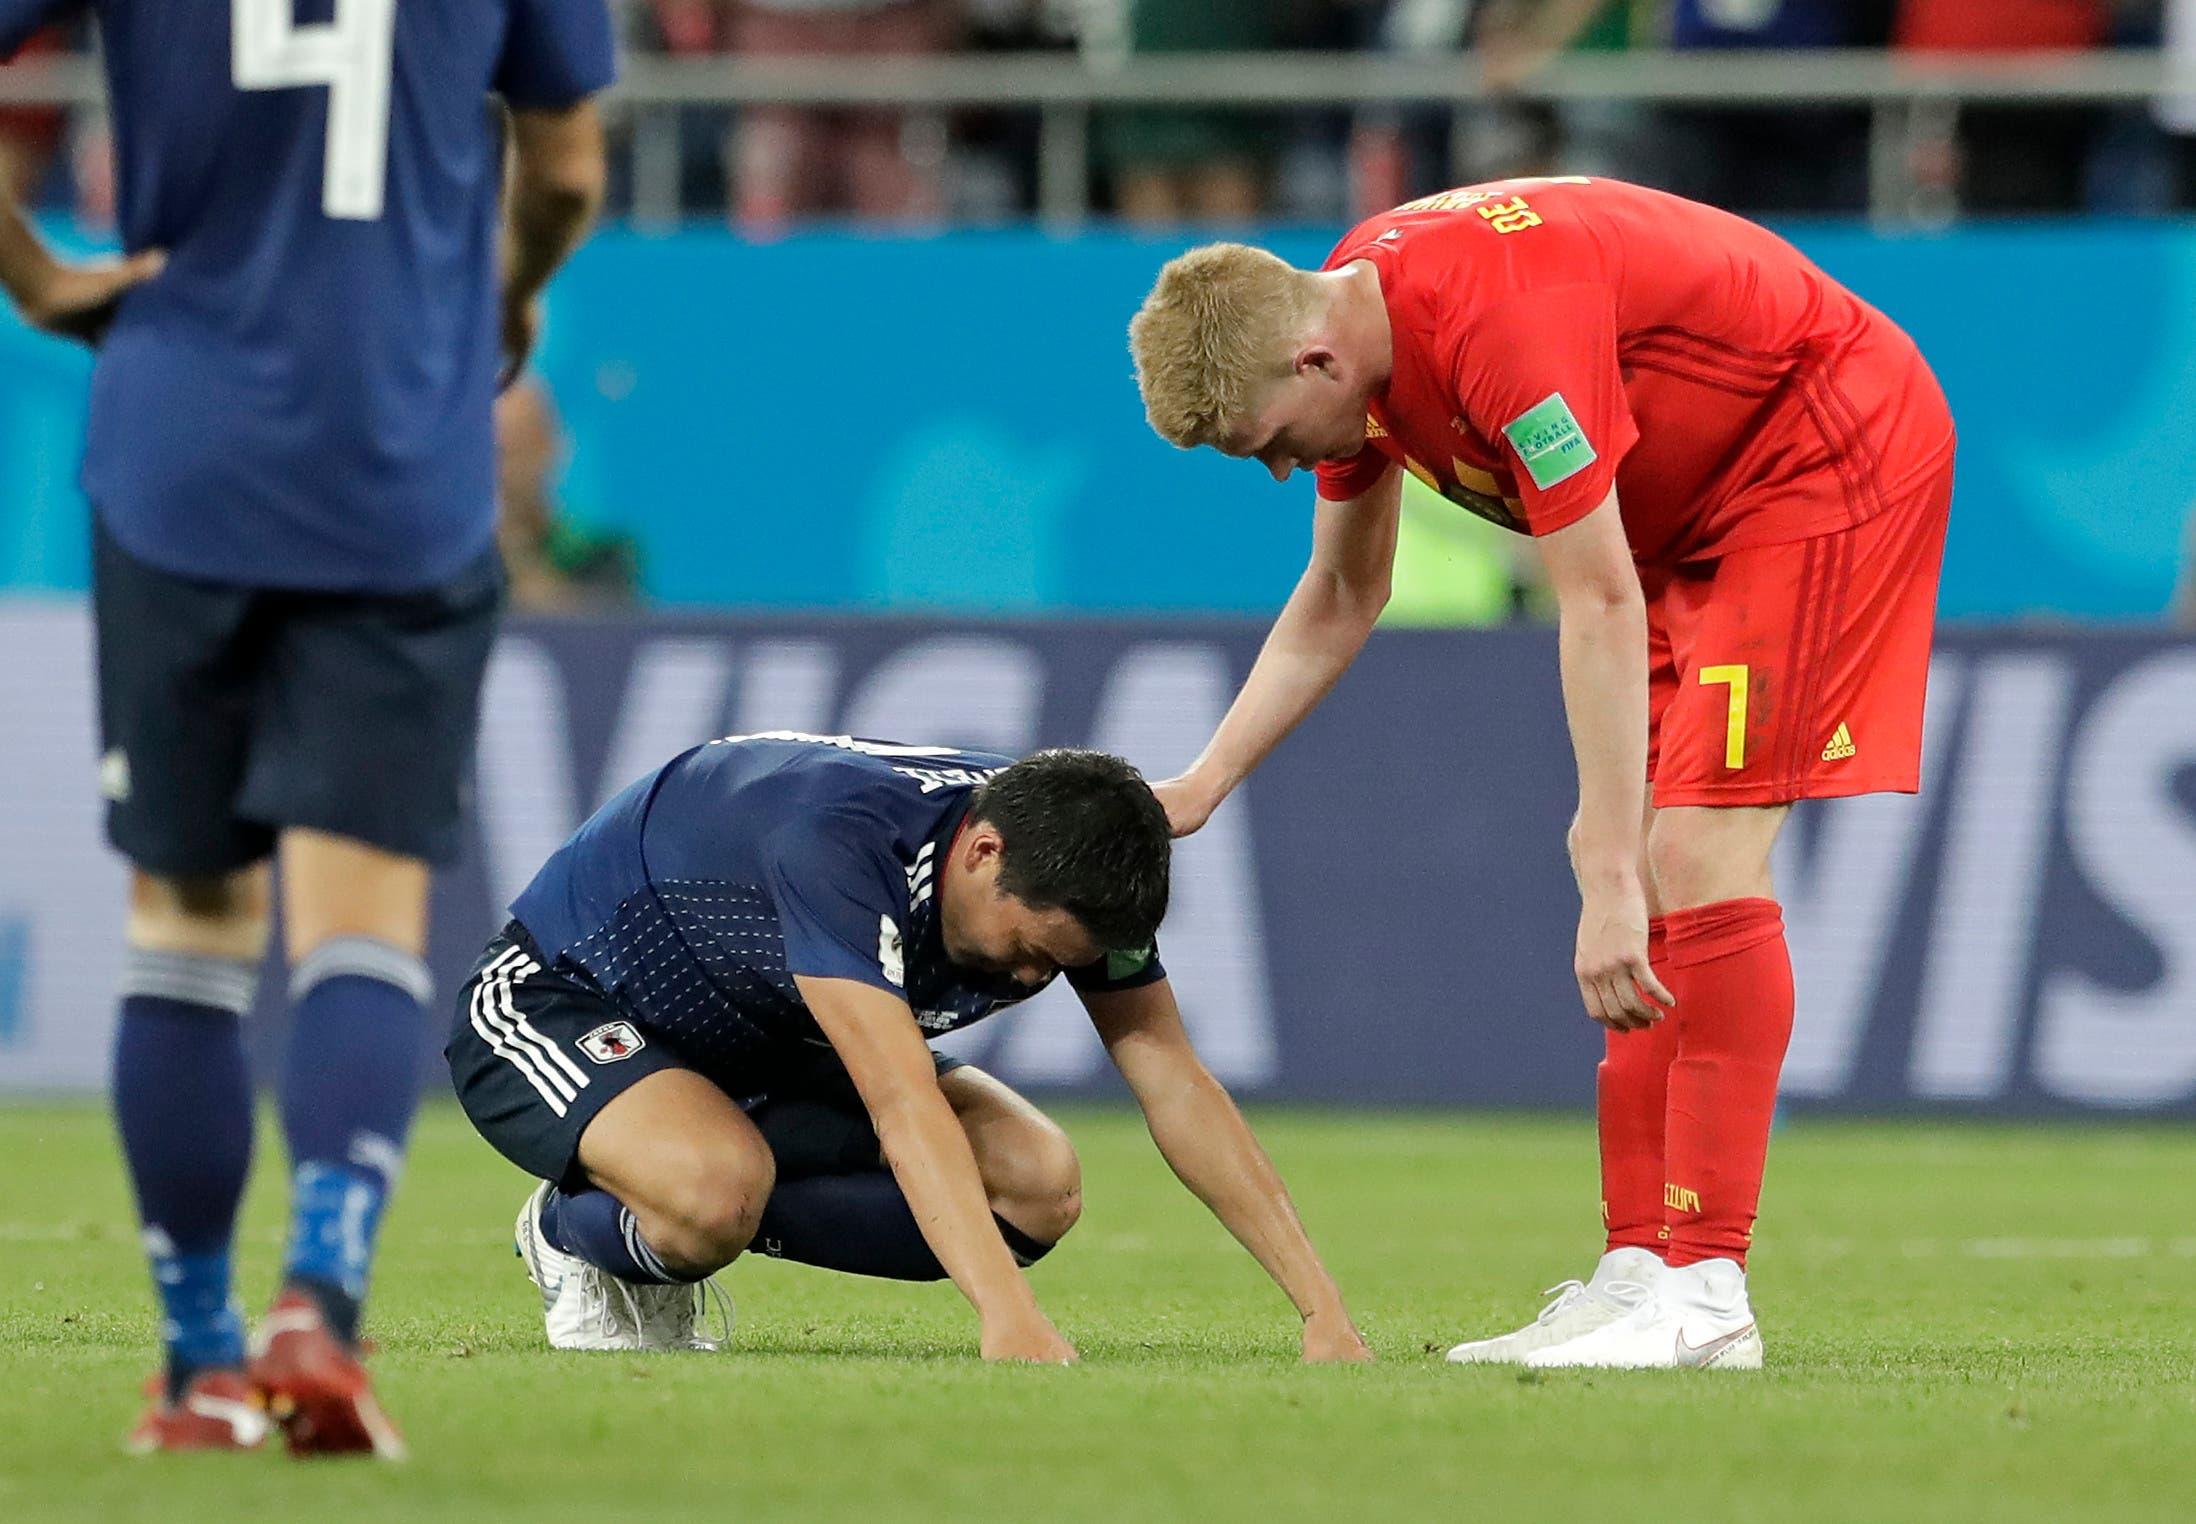 Belgiens Kevin De Bruyne tröstet einen japanischen Spieler nach dem Achtelfinal, den Belgien gewonnen hat.  (Bild: AP Photo/Petr David Josek, Rostov-on-Don, 2. Juli 2018)